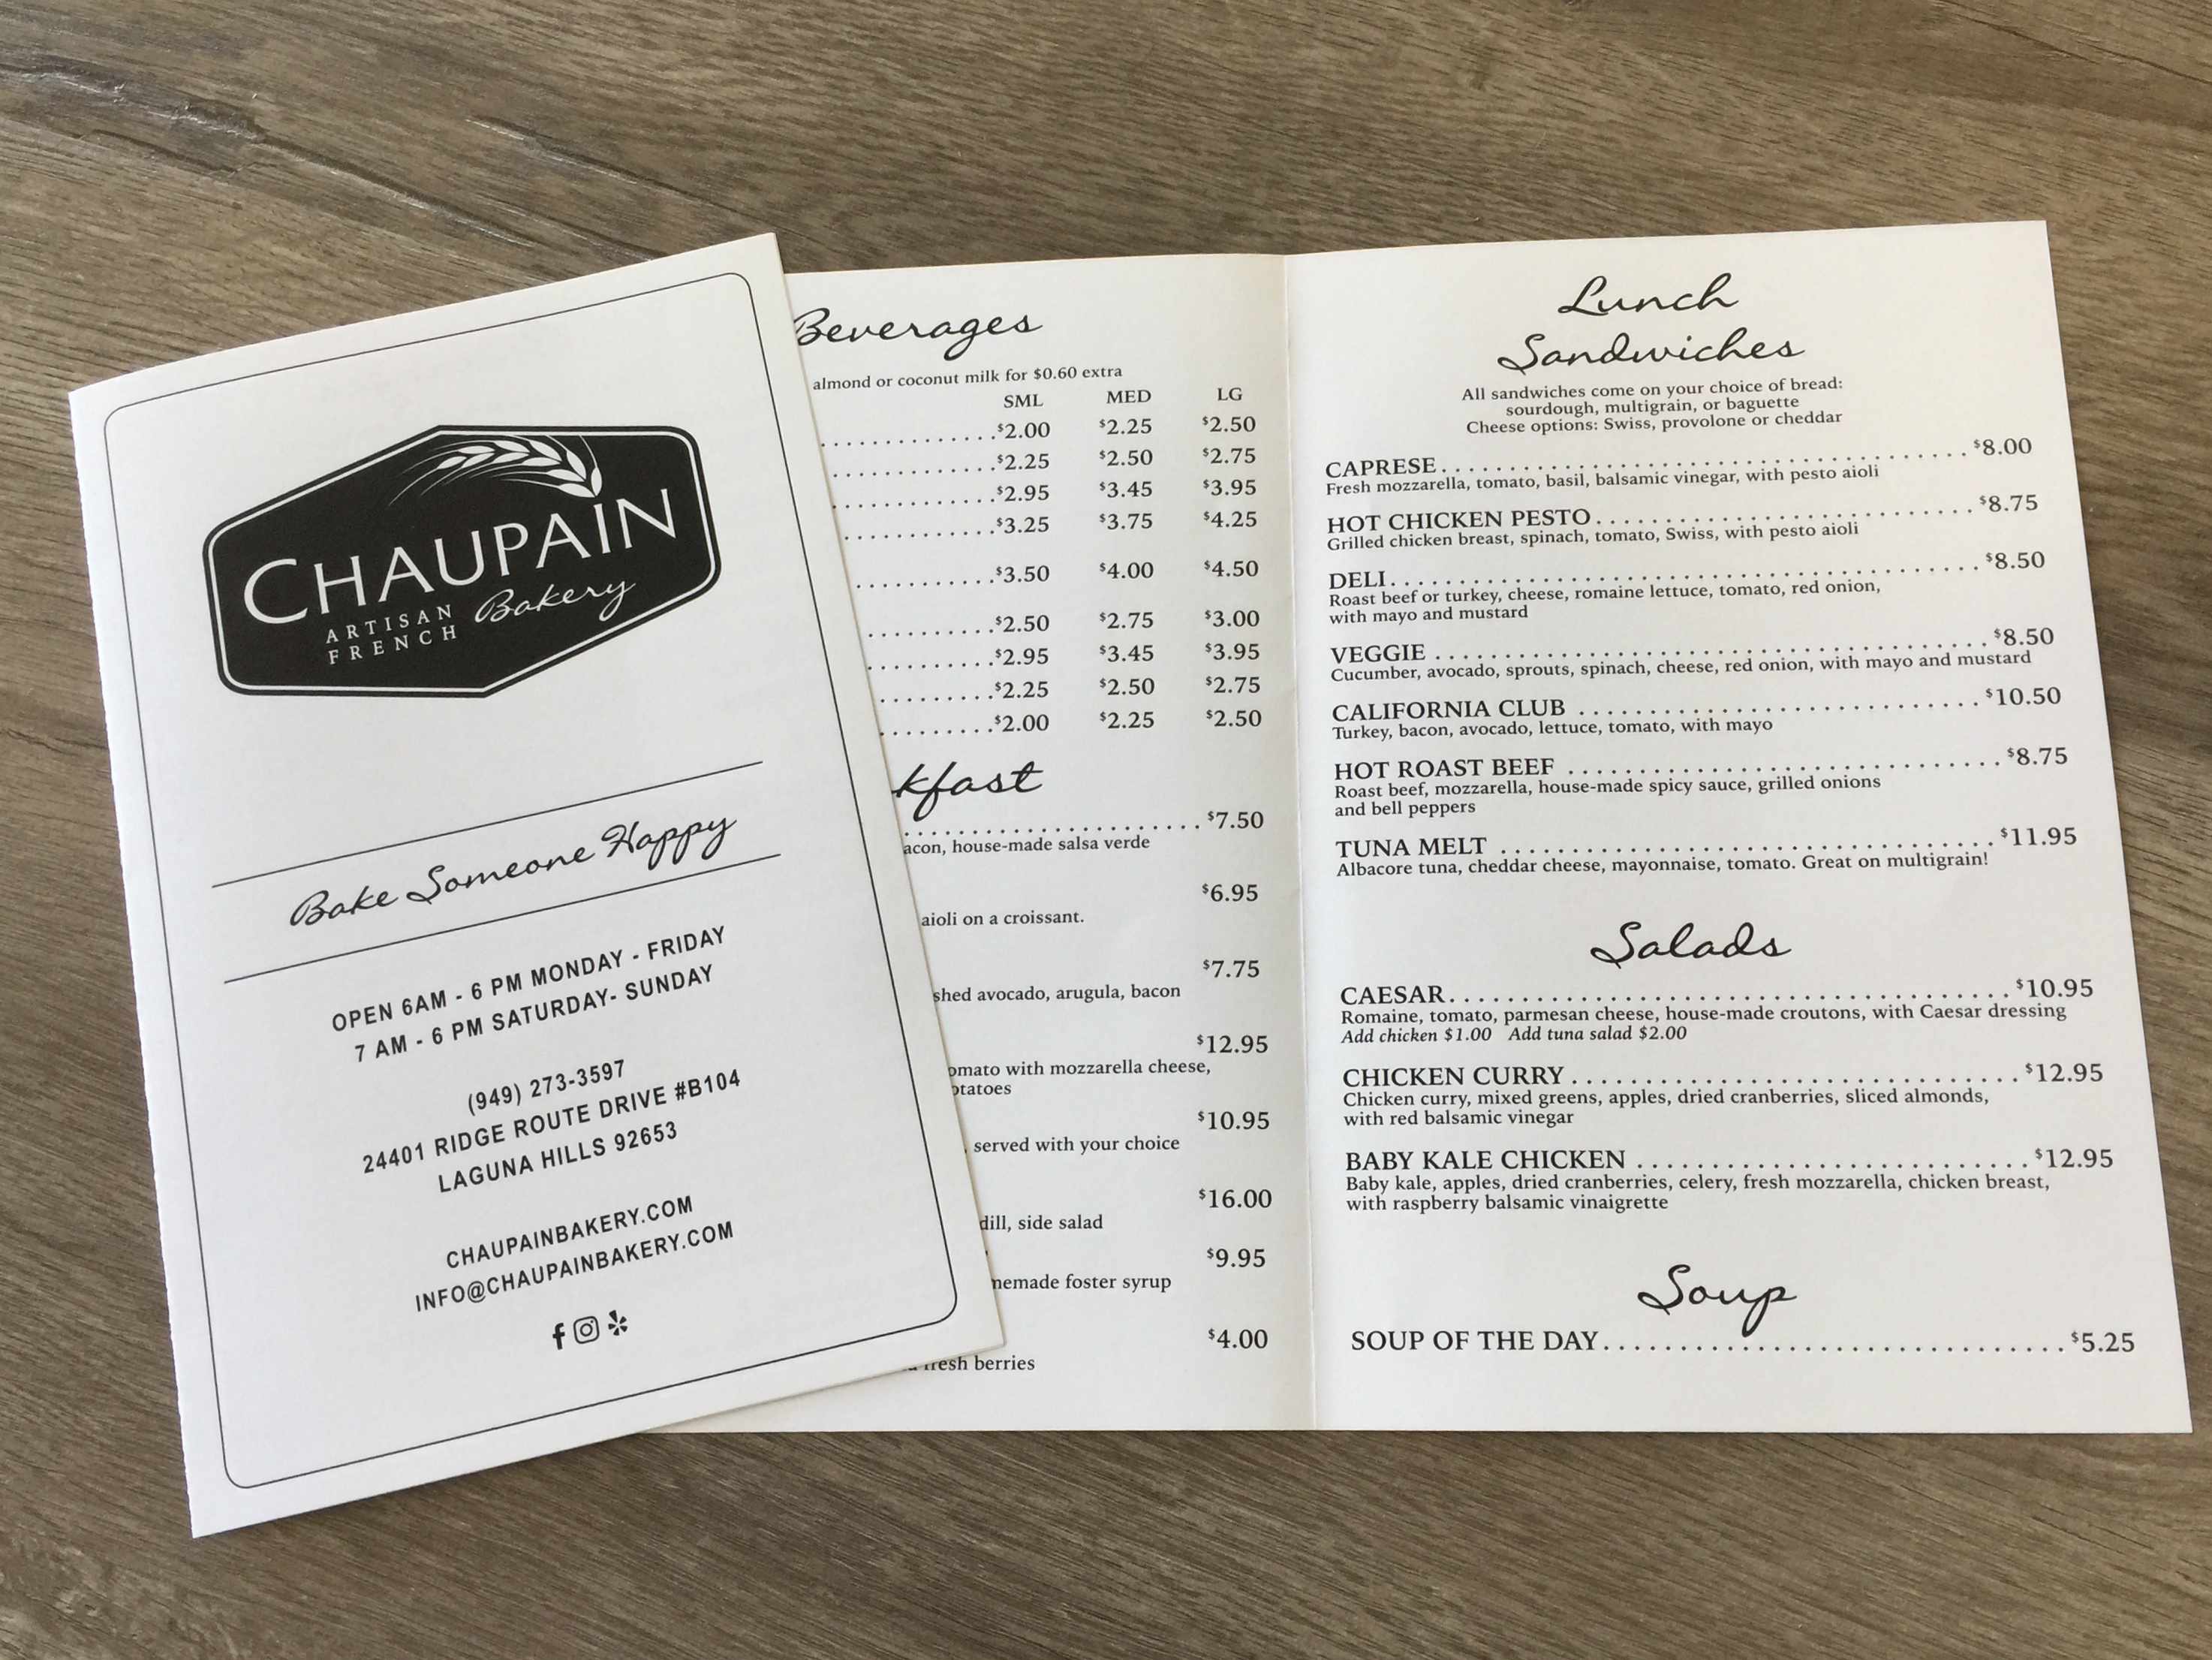 Restaurant Menu Printing Chaupain Bakery Laguna Hills Carlifornia